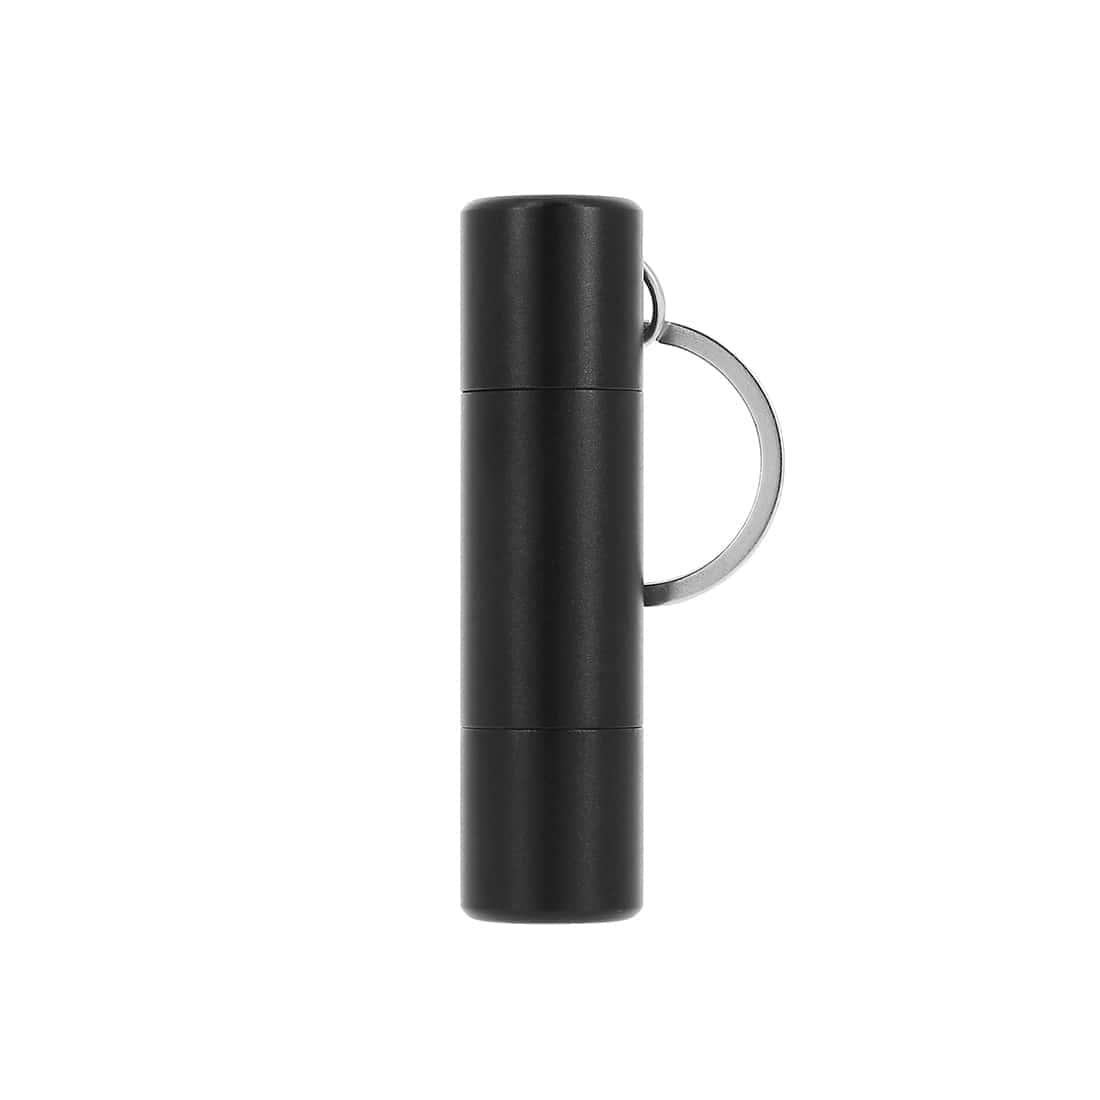 Emporte pi ce adorini double punch noir 29 00 - Coupe cigare emporte piece ...